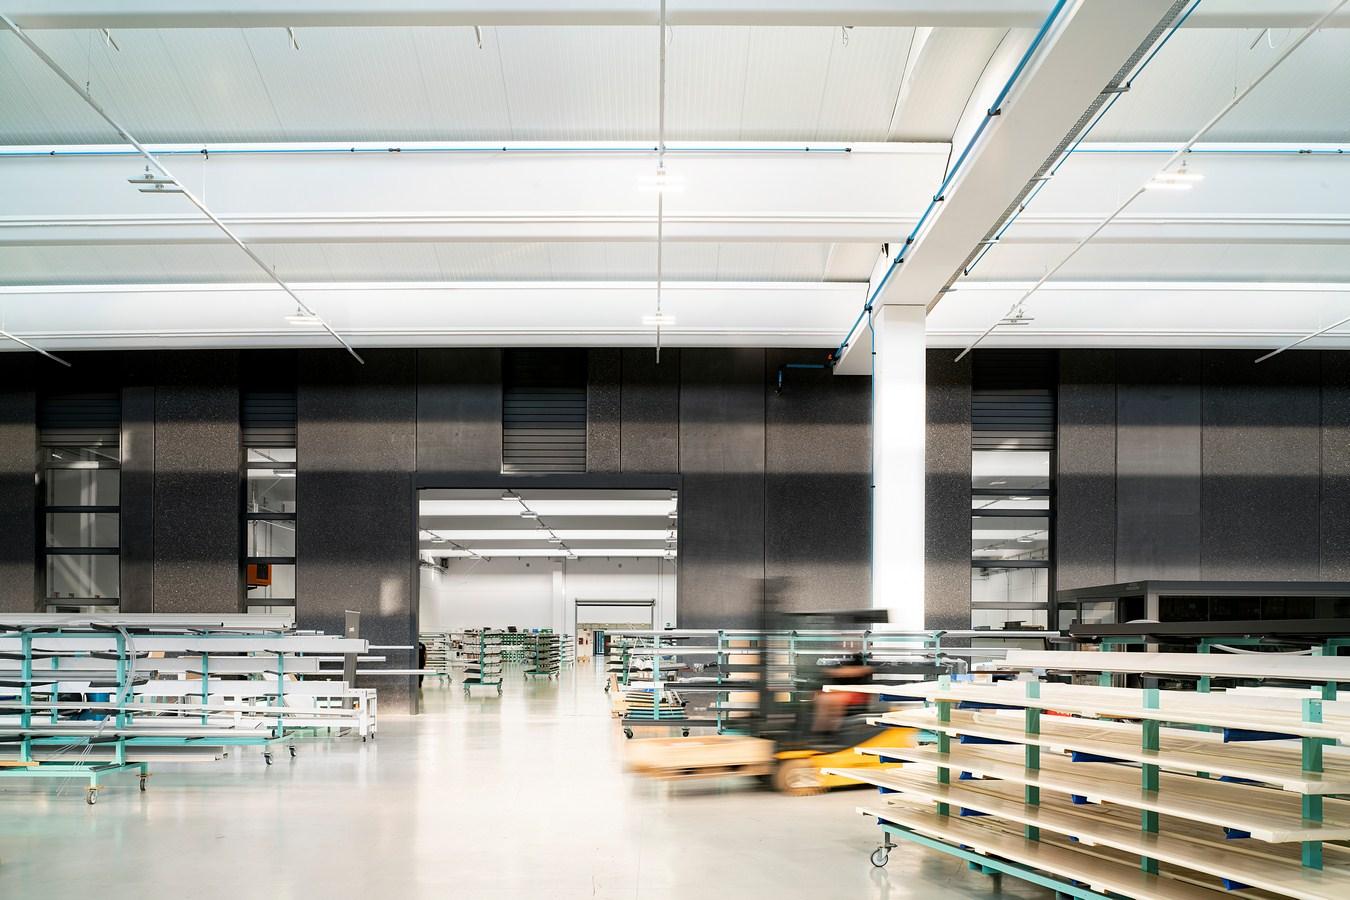 PRATIC 2.0 By GEZA - Gri e Zucchi Architettura - Sheet6